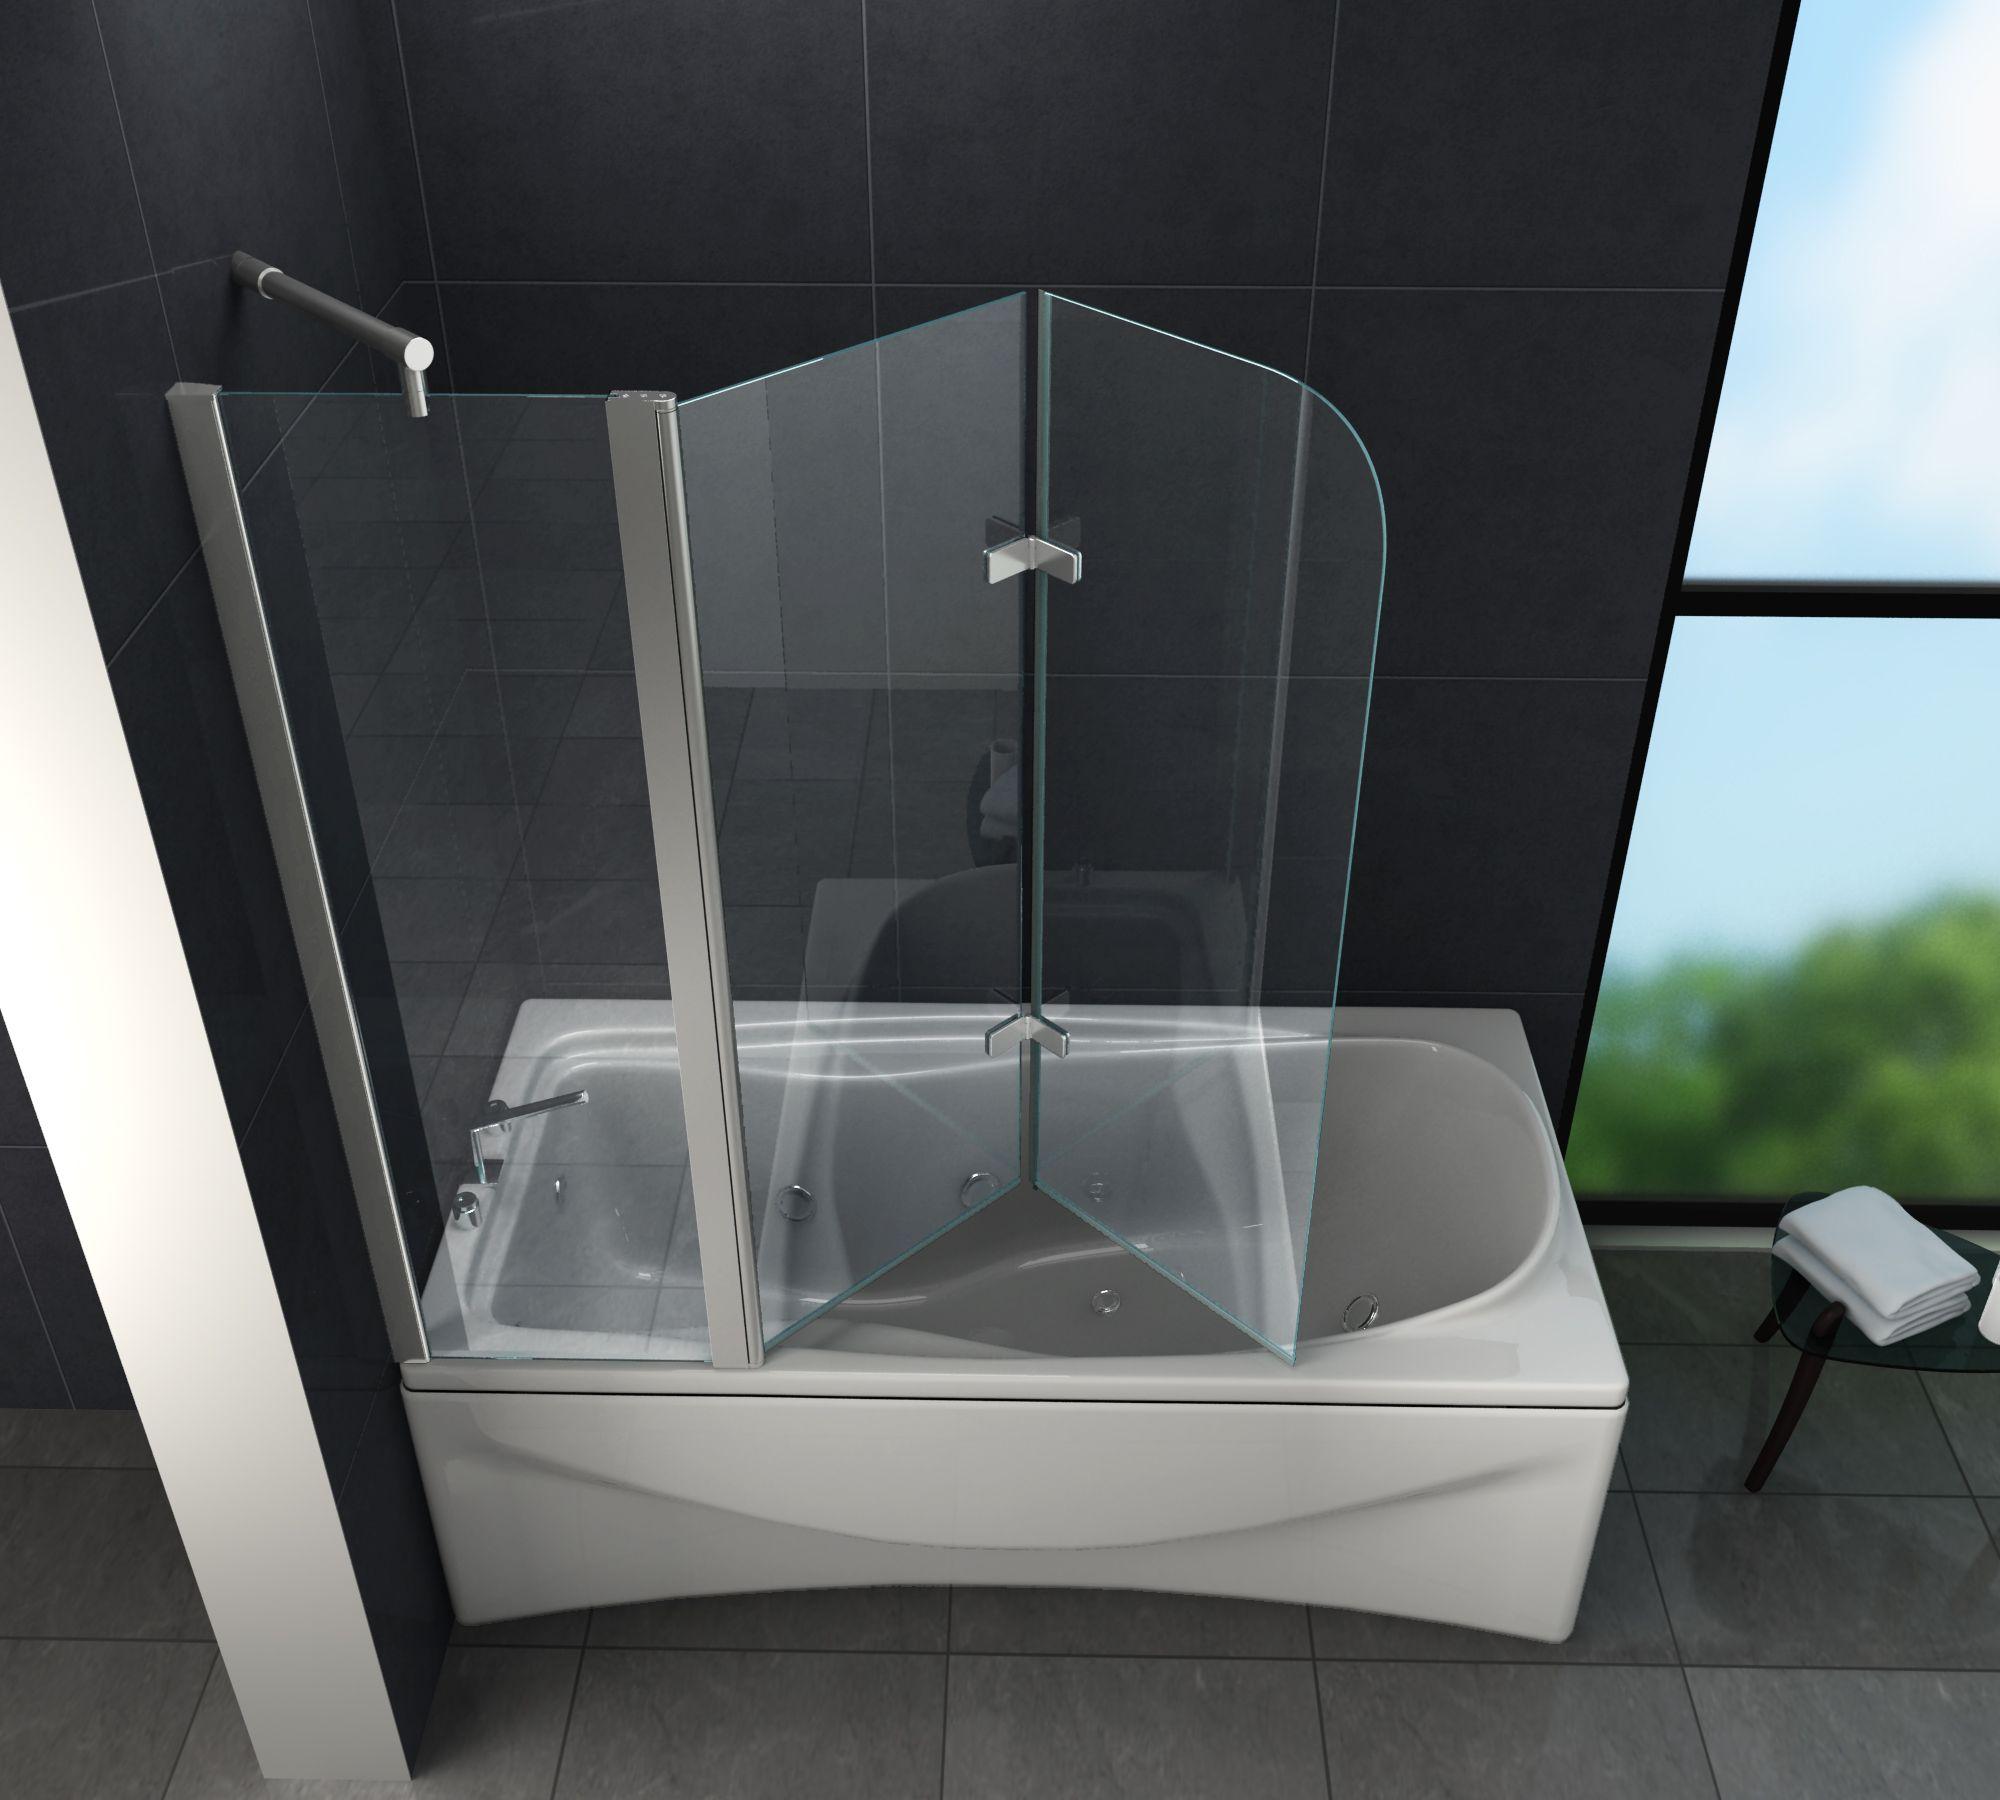 Duschtrennwand Triple 150 X 140 Badewanne Duschtrennwand Dusche Duschabtrennung